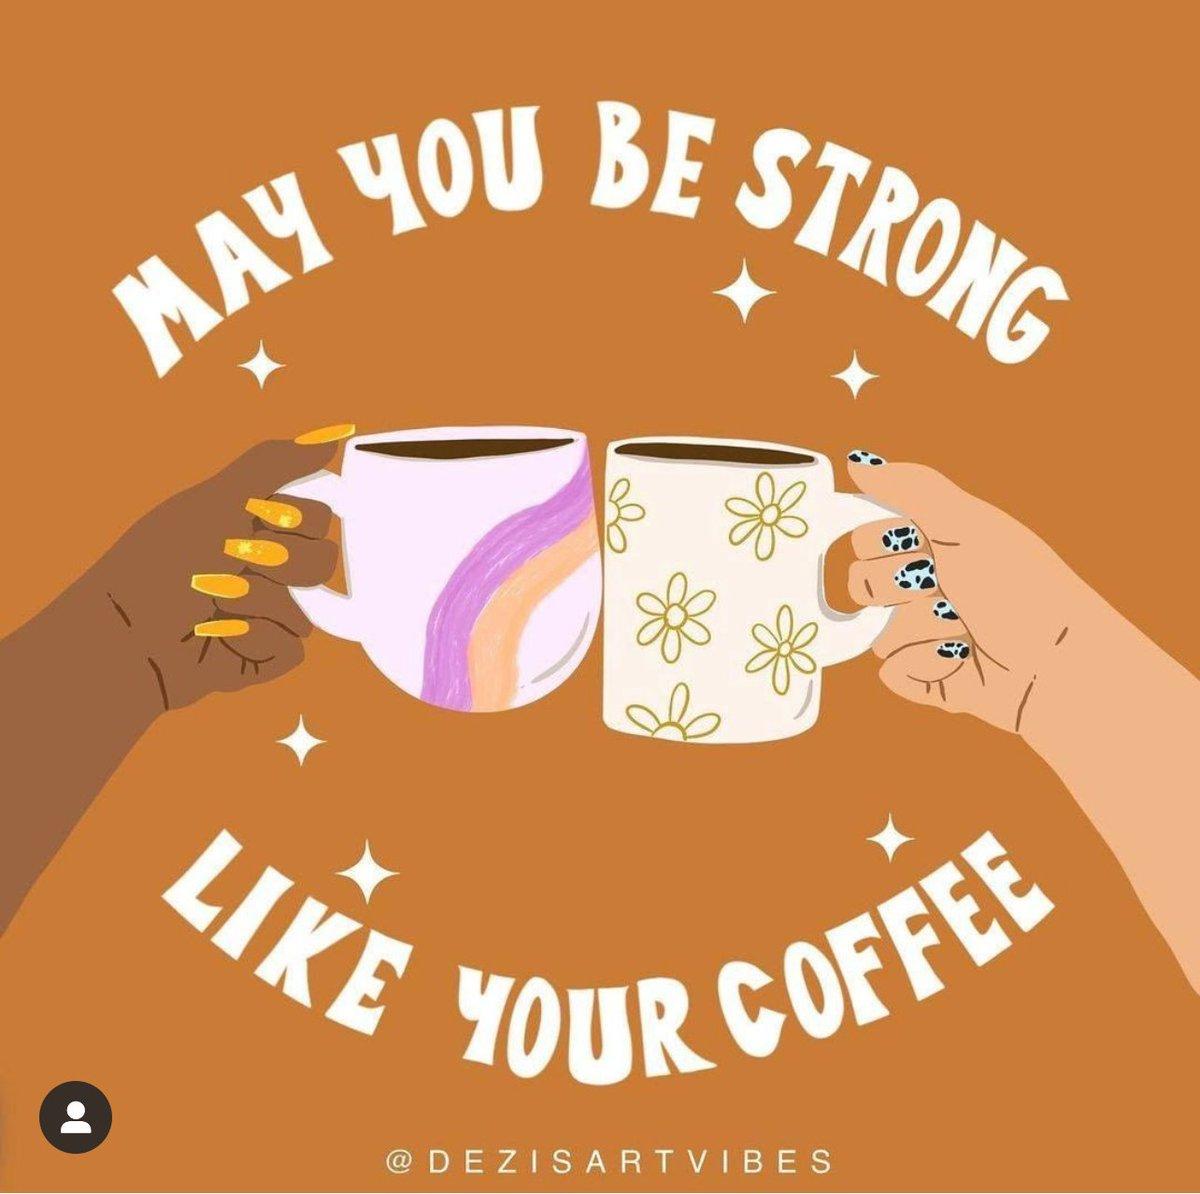 ☕💖  #TGIF #Coffee #MakersWomen #bestrong #bekind  #friday #weekend #friyay #love #instagood #happyfriday #weekendvibes #happy #fridayfeeling #coffeetime #coffeegram #coffeelove #caffeine #coffeebreak #morning #coffeelife #instacoffee